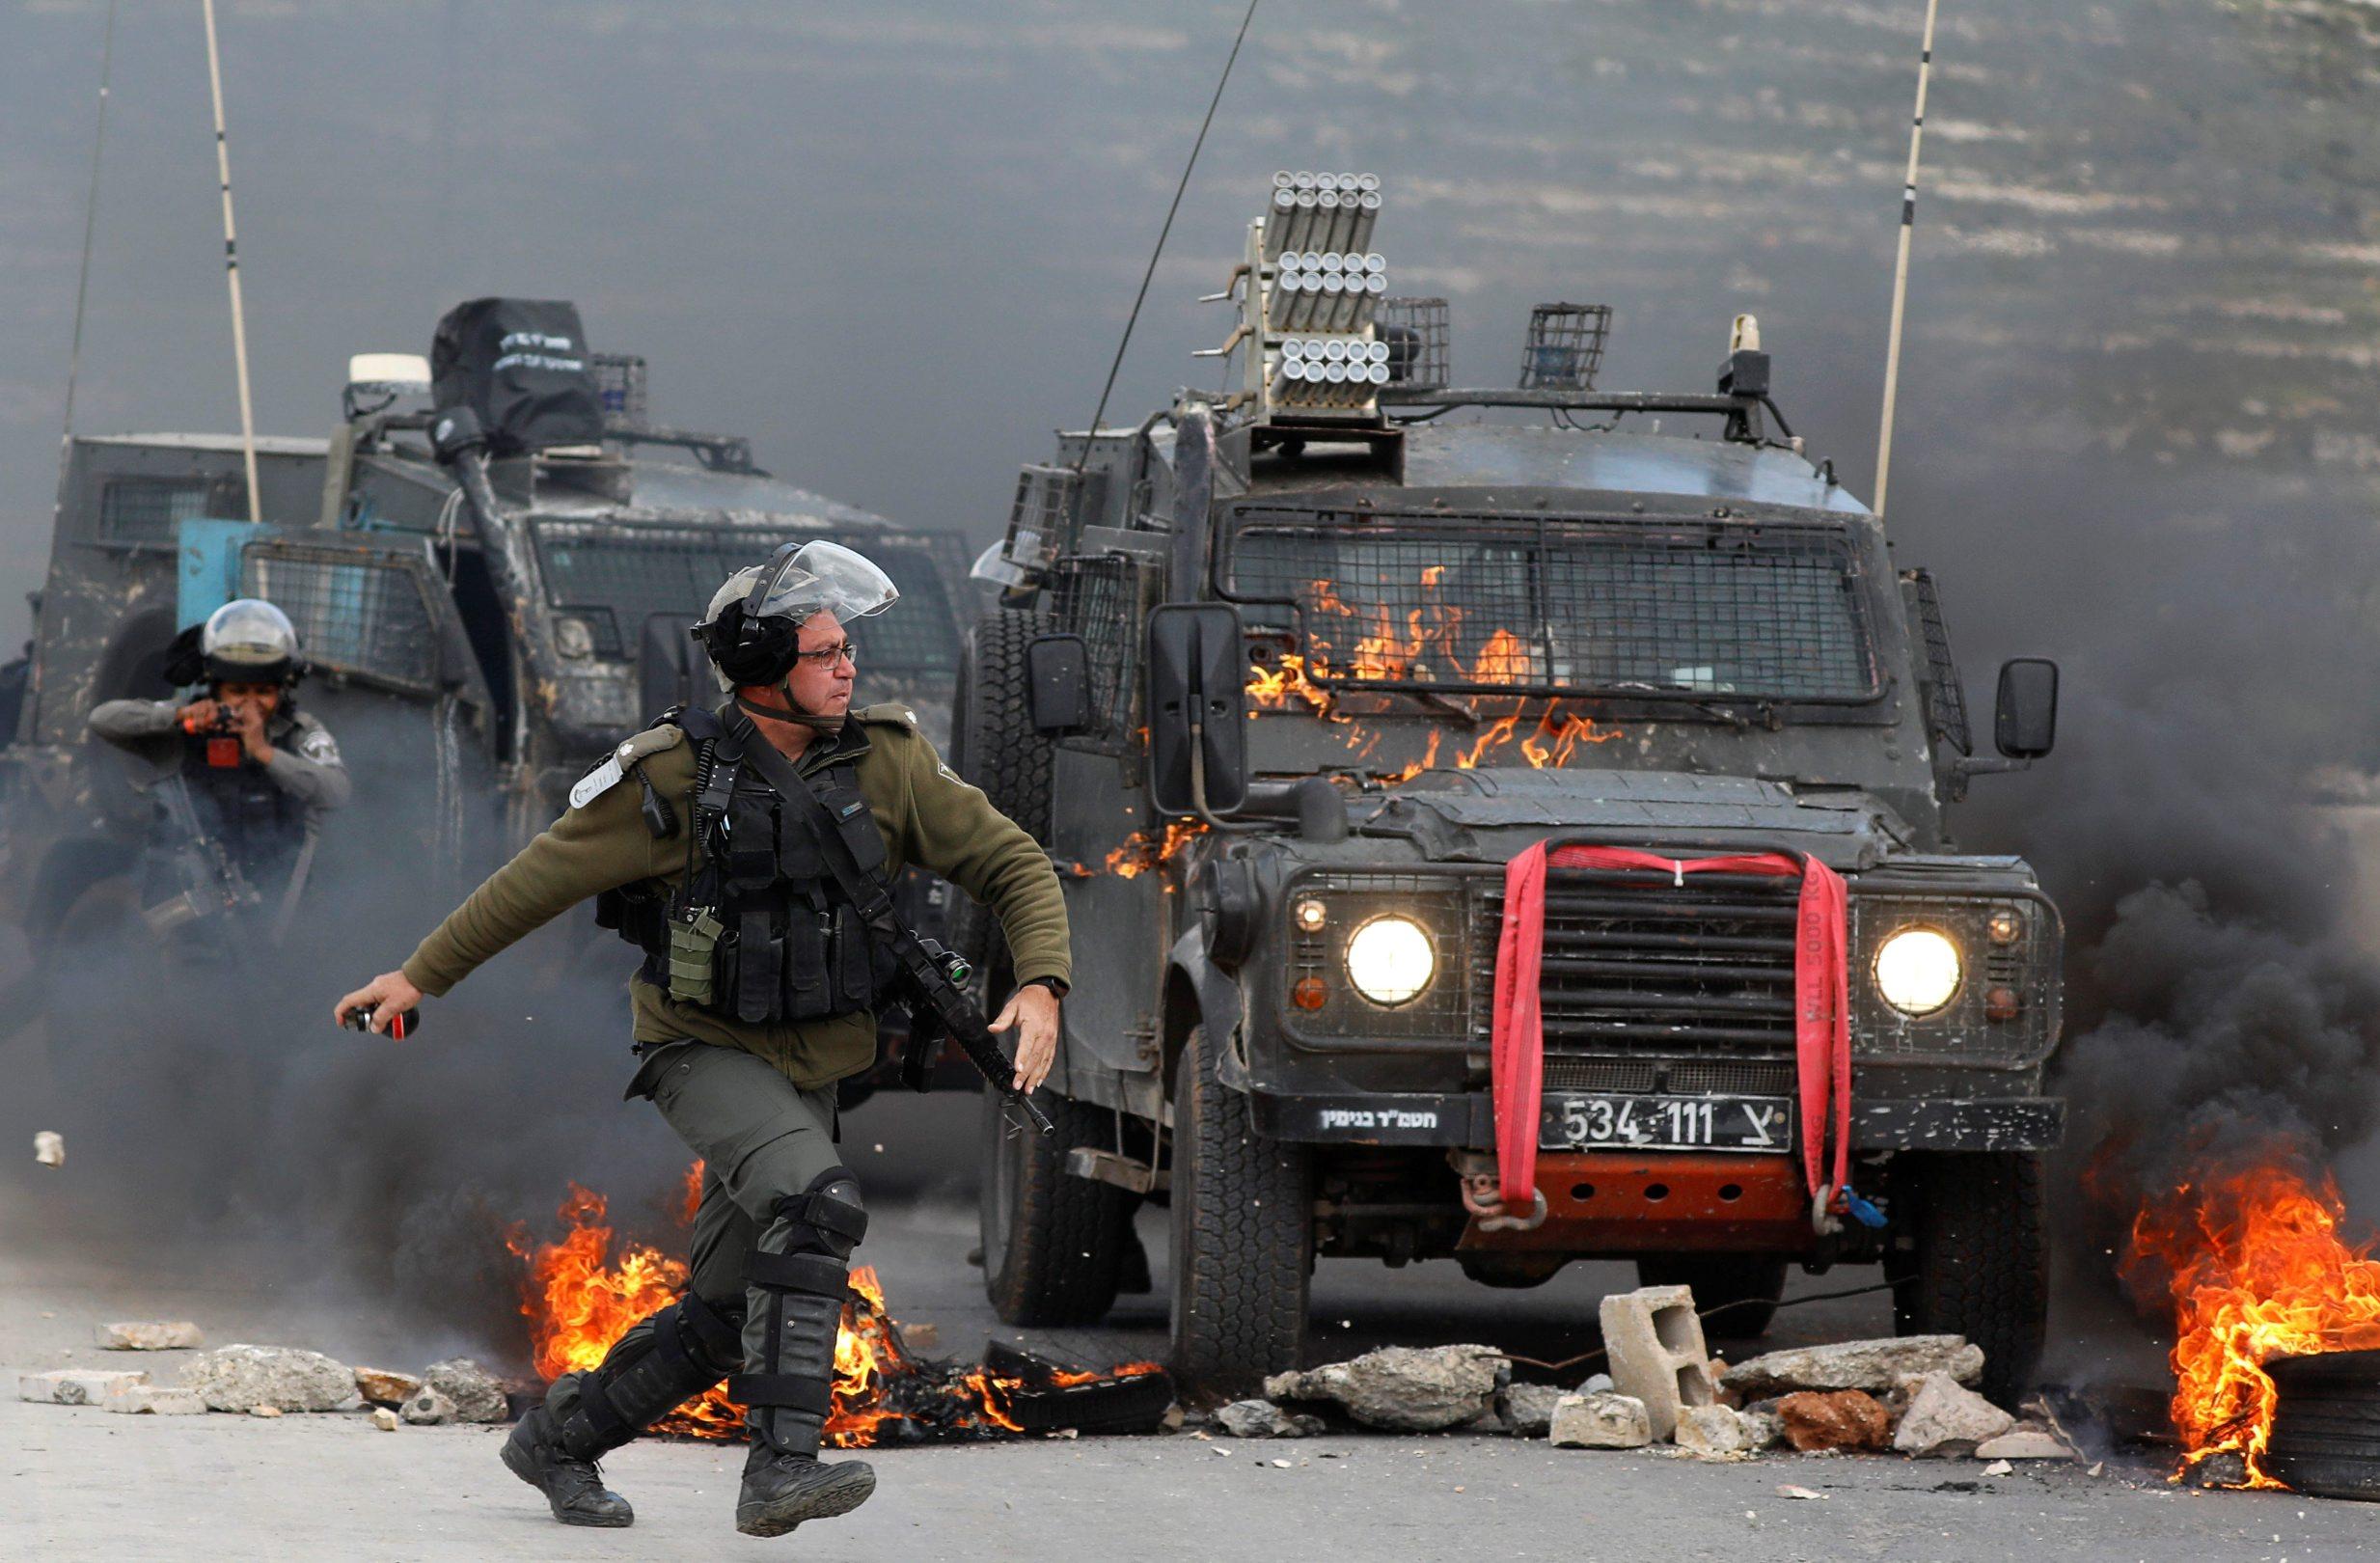 2019-03-27T123237Z_230247145_RC1AEC8343D0_RTRMADP_3_ISRAEL-PALESTINIANS-VIOLENCE